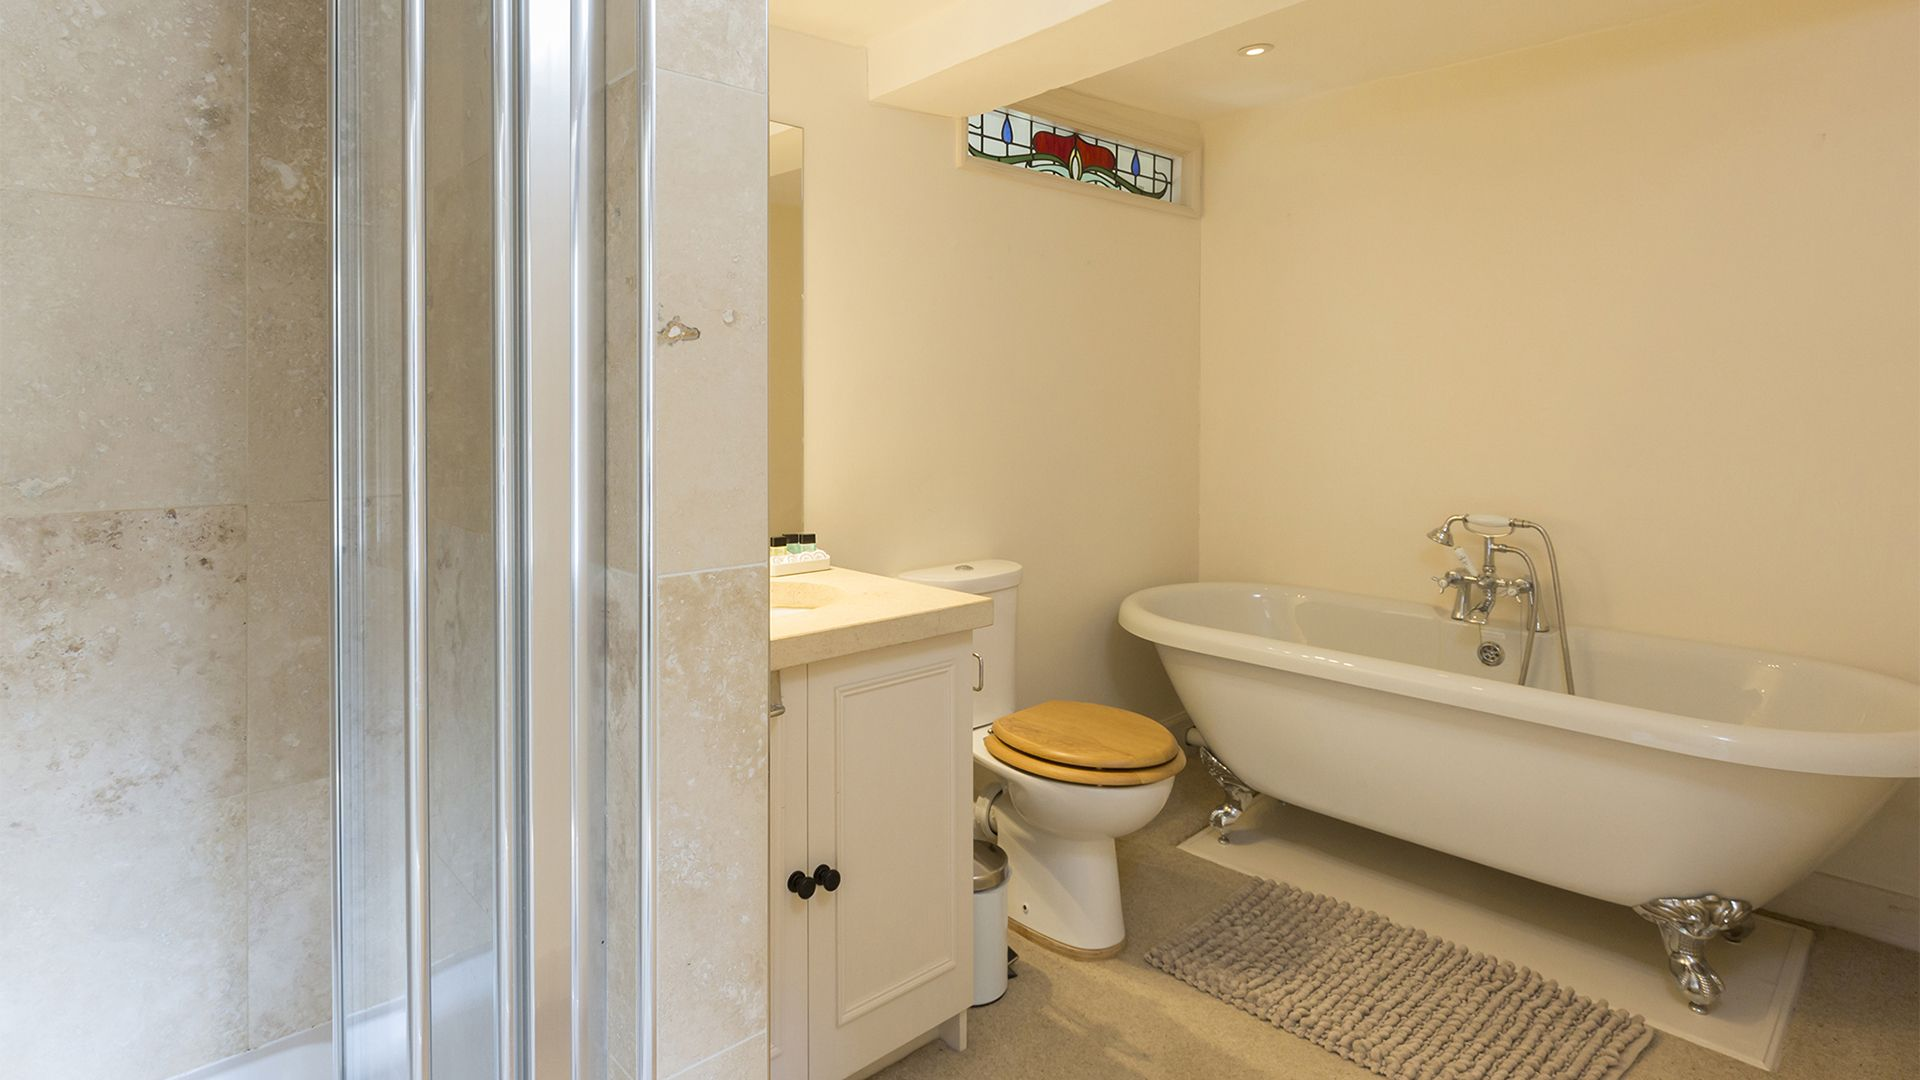 Bathroom, Almsbury Farmhouse at Sudeley Castle, Bolthole Retreats